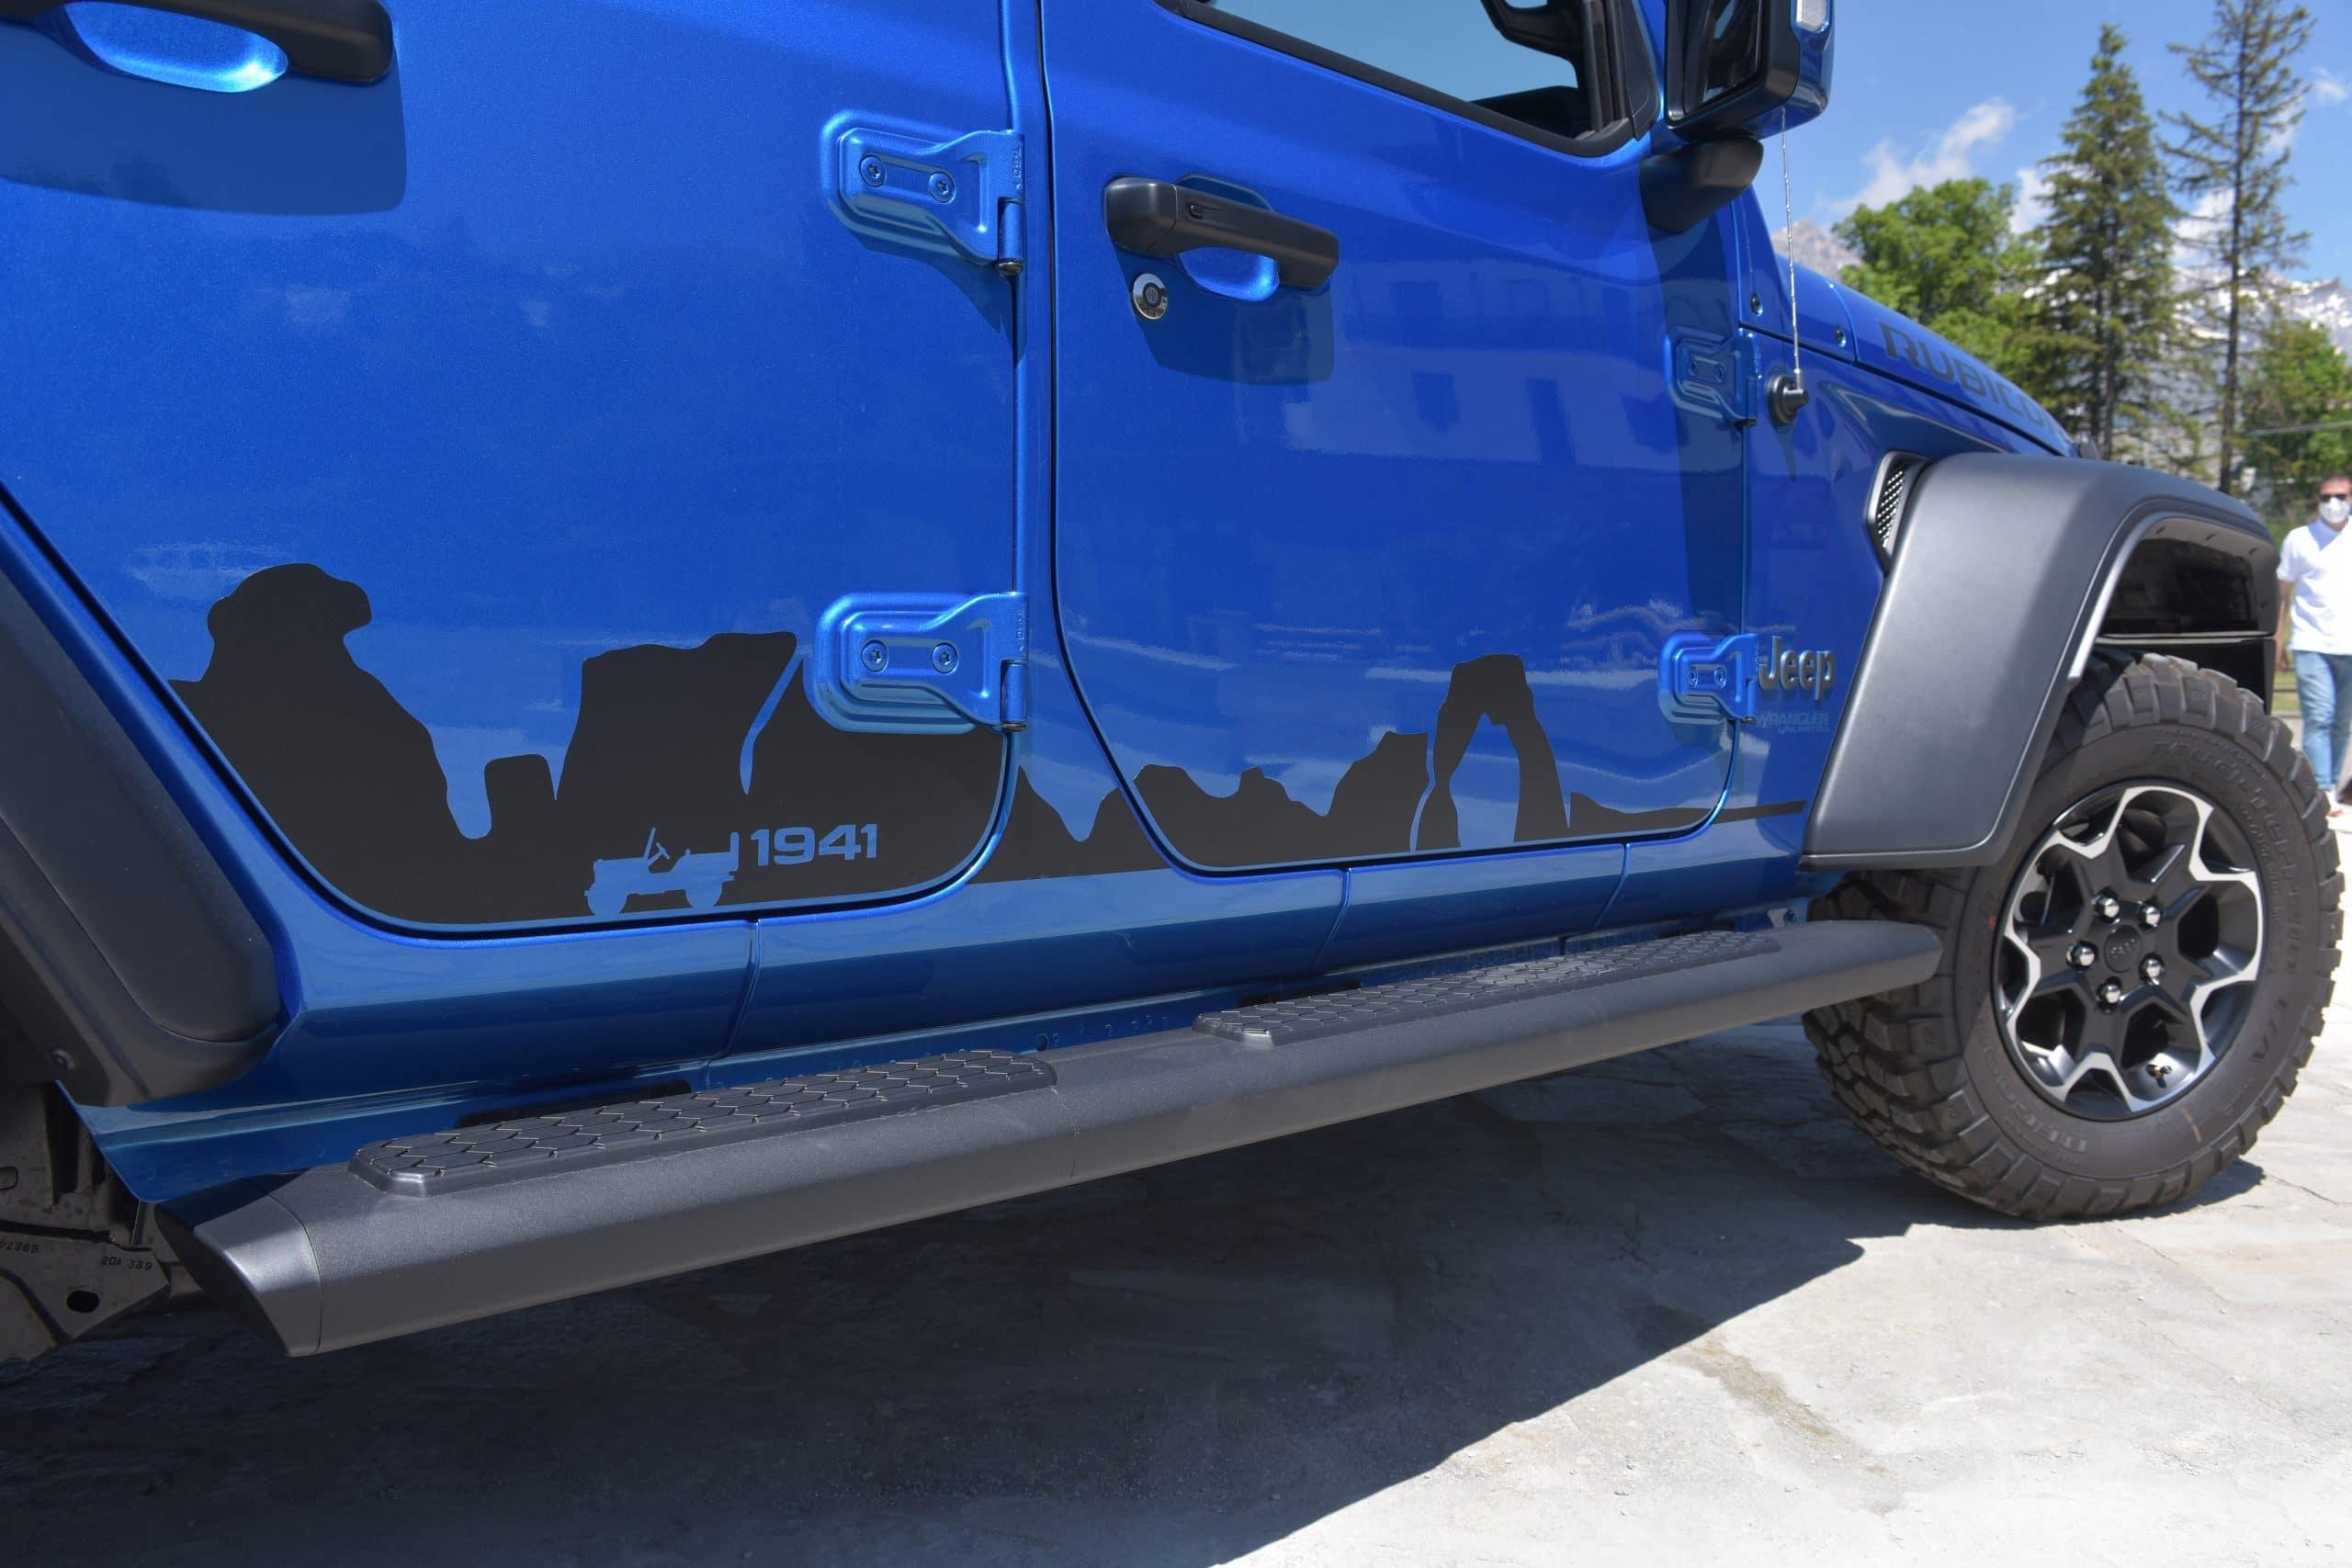 06 Jeep Wrangler 4xe scaled Νέα σειρά αξεσουάρ για το Plug-in Hybrid, Jeep Wrangler 4xe Jeep, Jeep 4XE, Mopar, Wrangler, Wrangler 4XE, ειδήσεις, Νέα